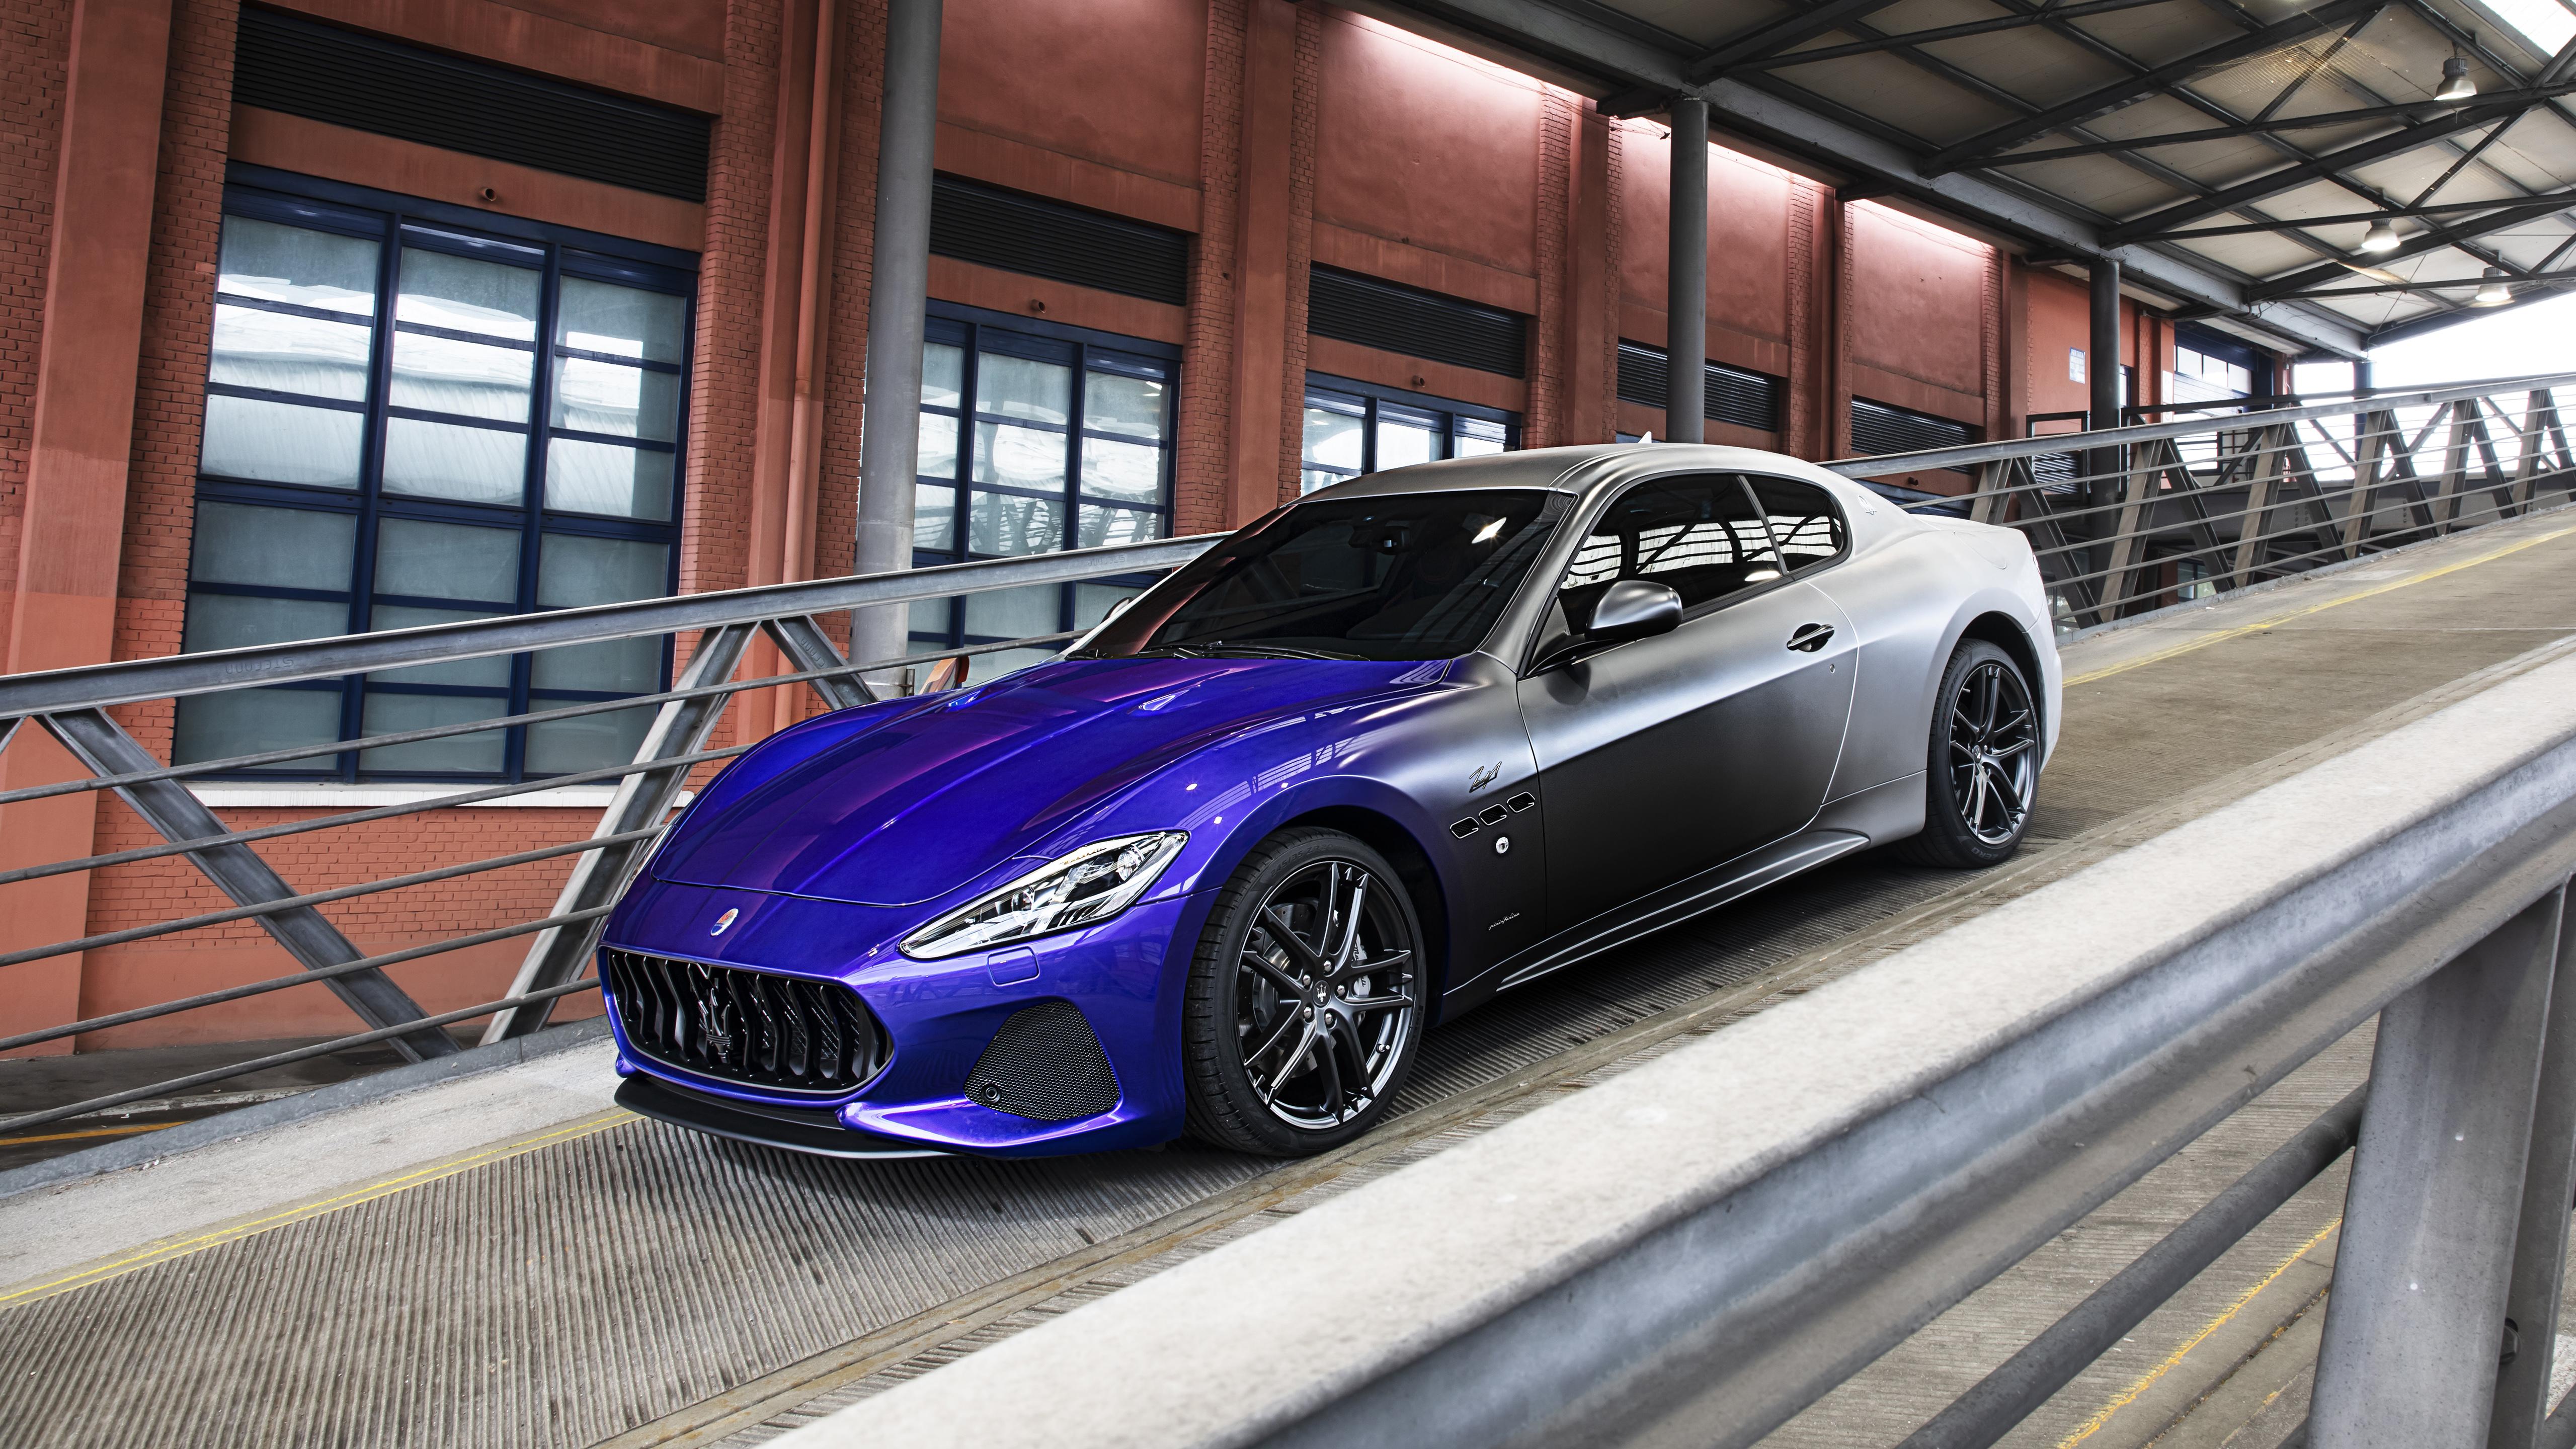 Maserati GranTurismo Zeda 2019 by Pininfarina 4K 2 ...